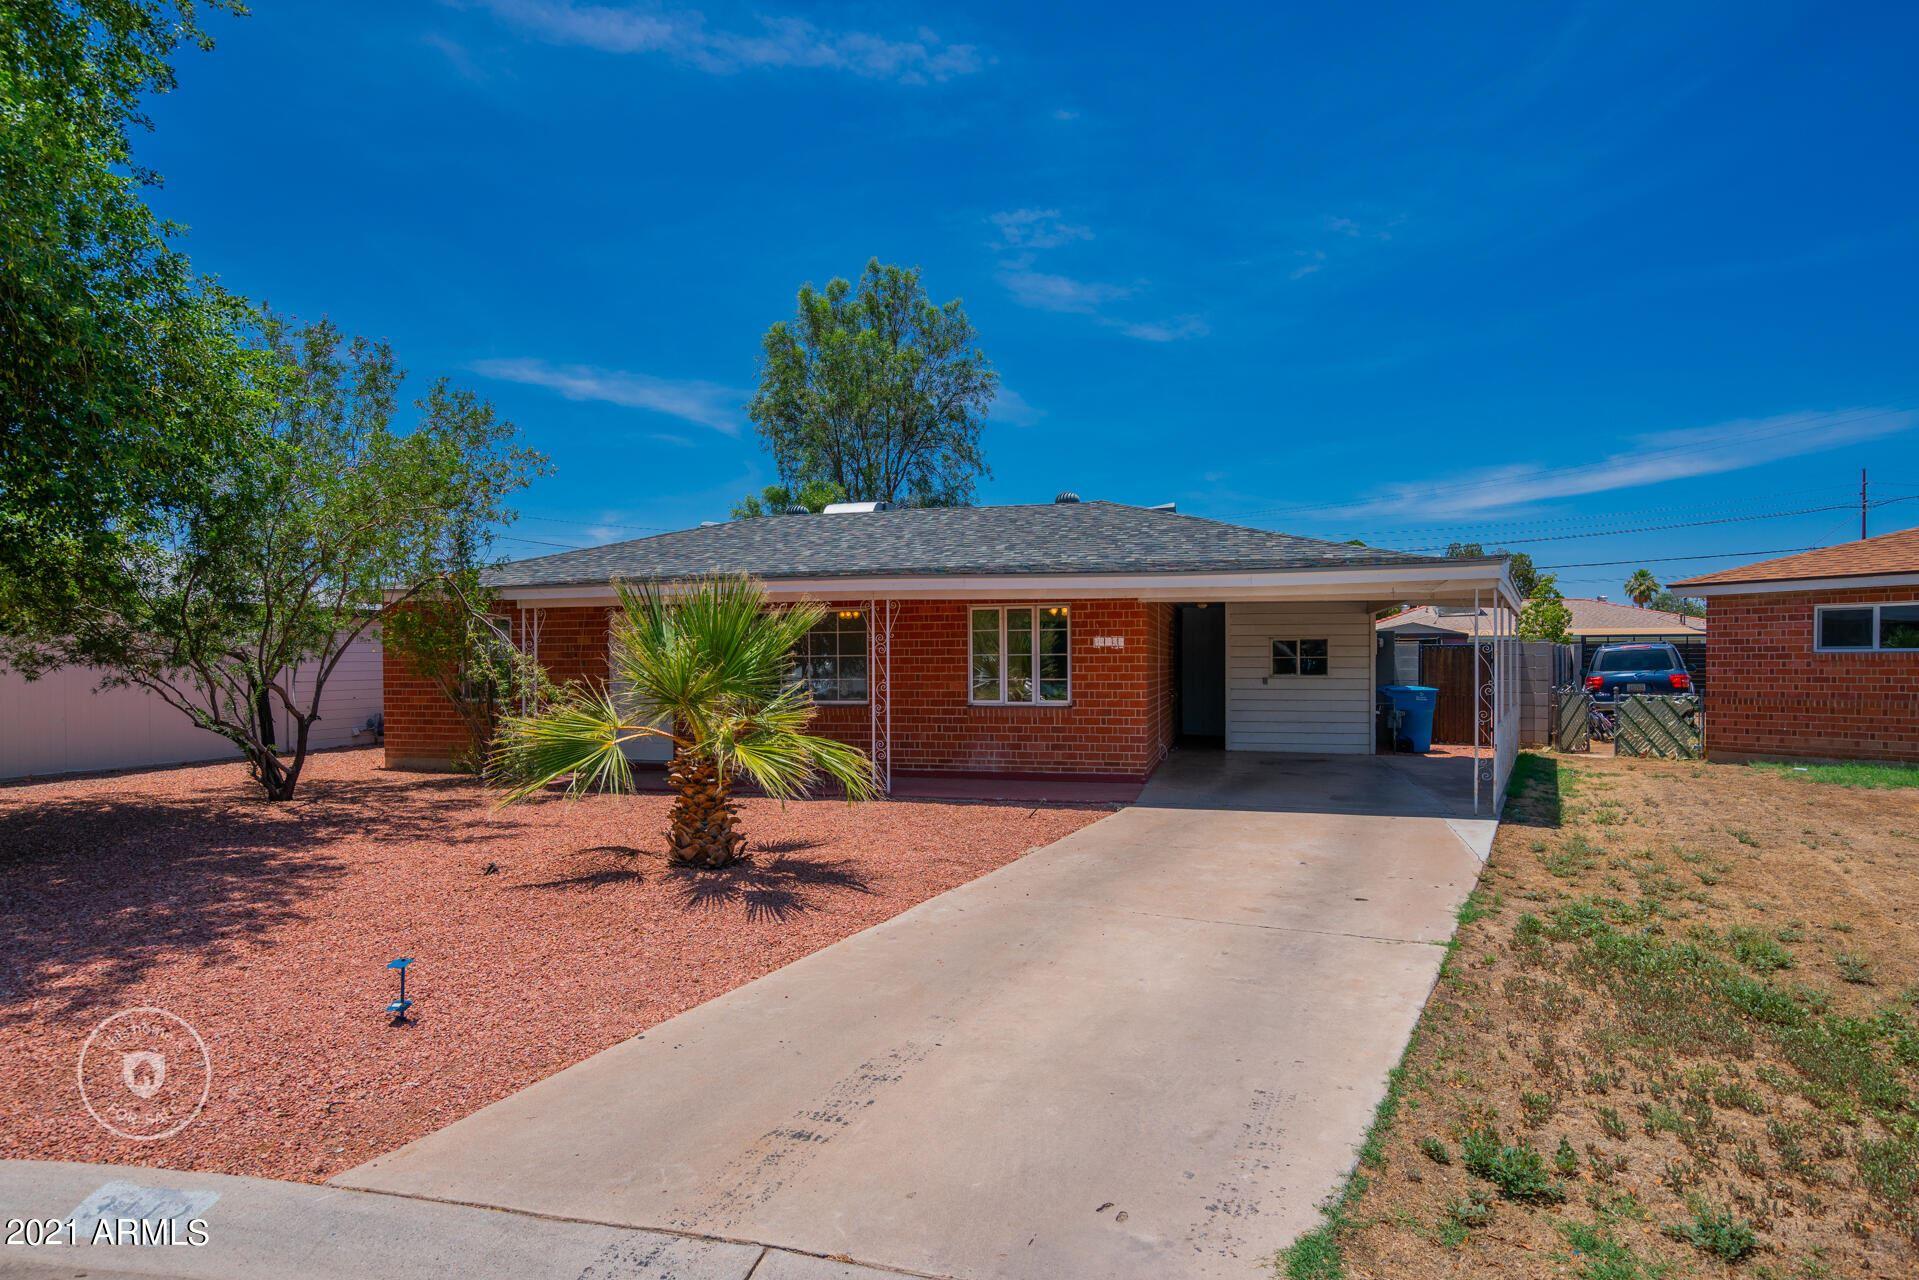 3412 N 24TH Avenue, Phoenix, AZ 85015 - MLS#: 6261418